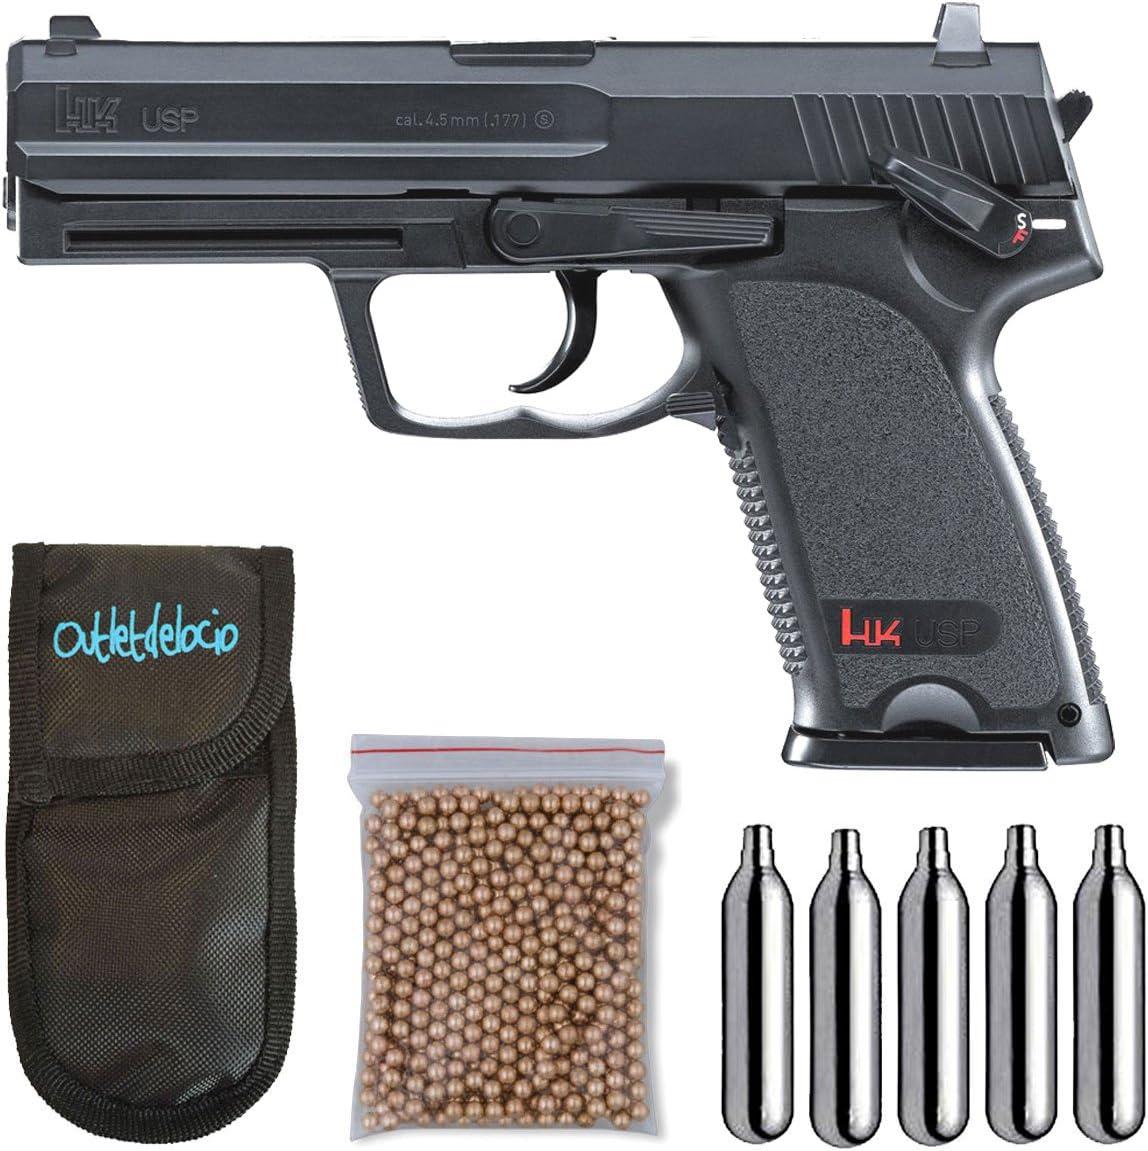 Umarex U58100. Pistola perdigon H&K USP Gas Co2. 4,5mm. + Funda Portabombonas + Balines + Bombonas co2. 23054/29318/13275